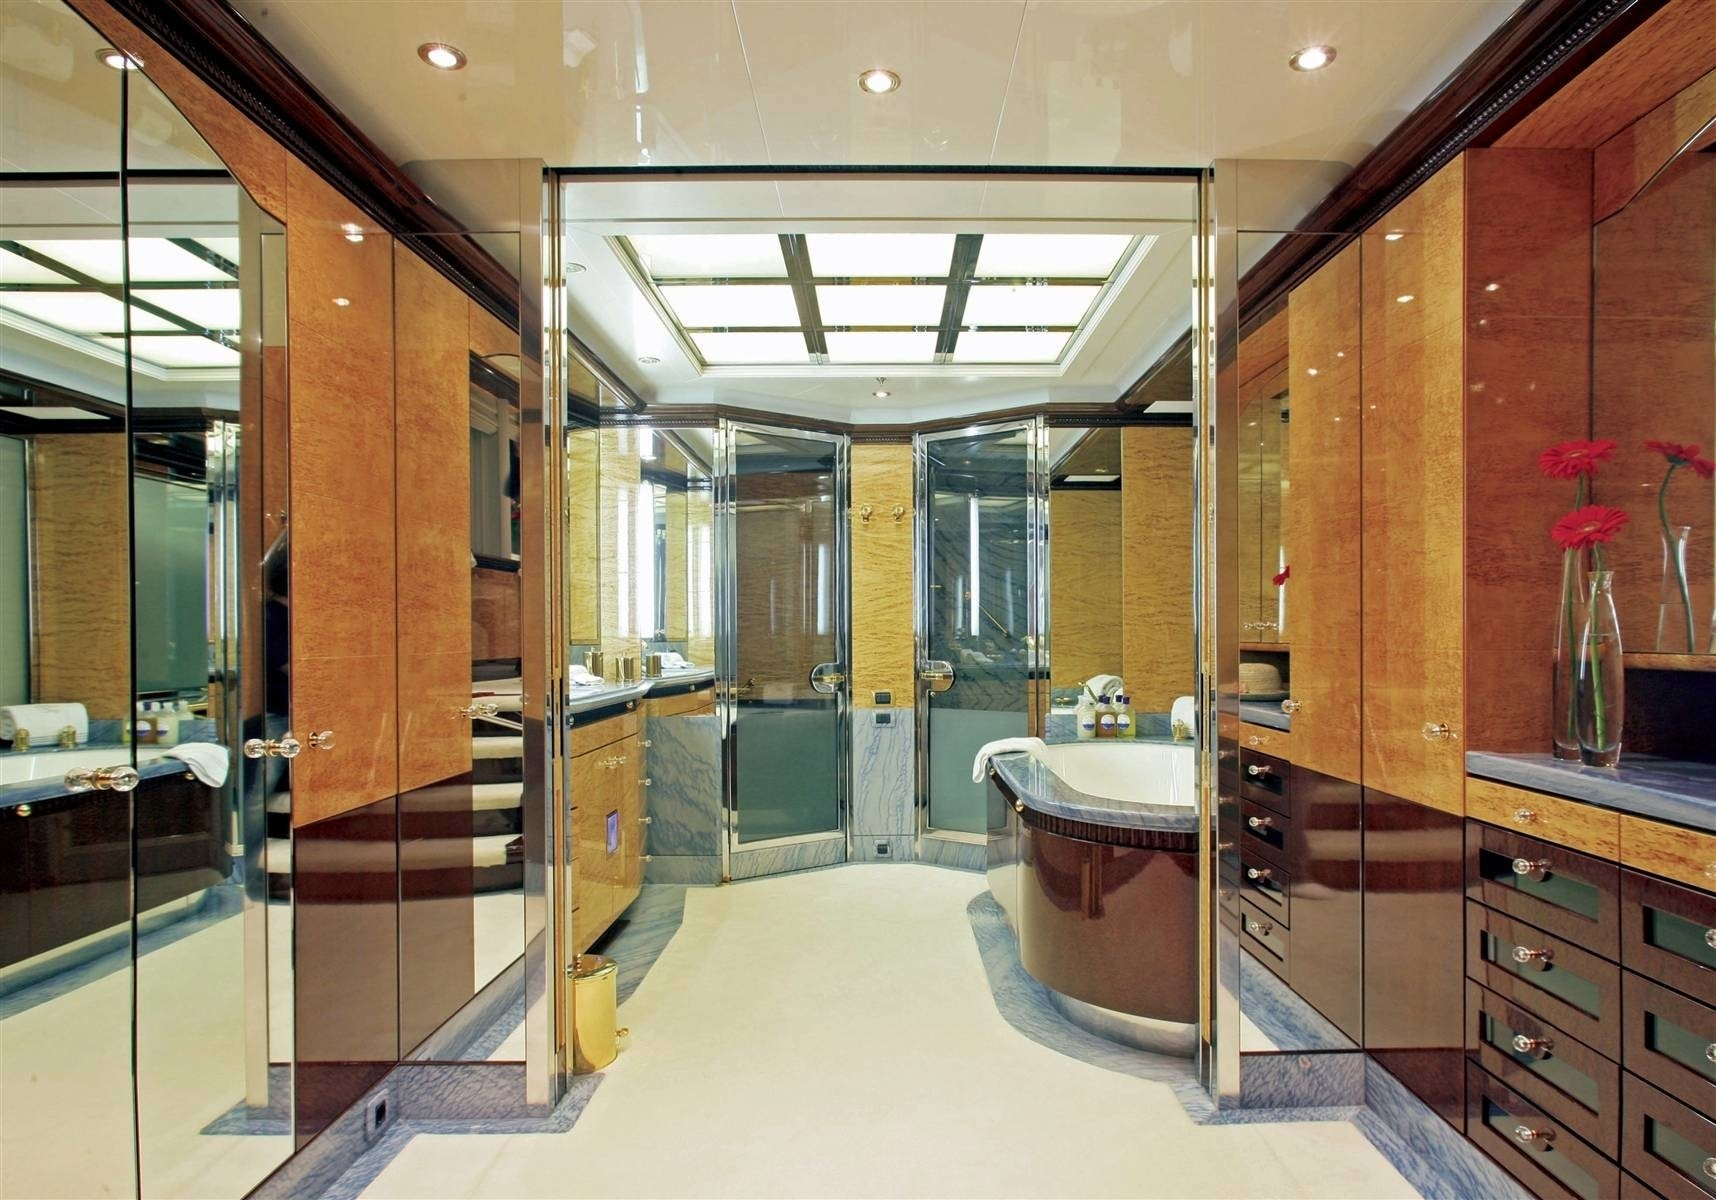 Hers Bath: Yacht LUCKY LADY's Main Master Cabin Photograph